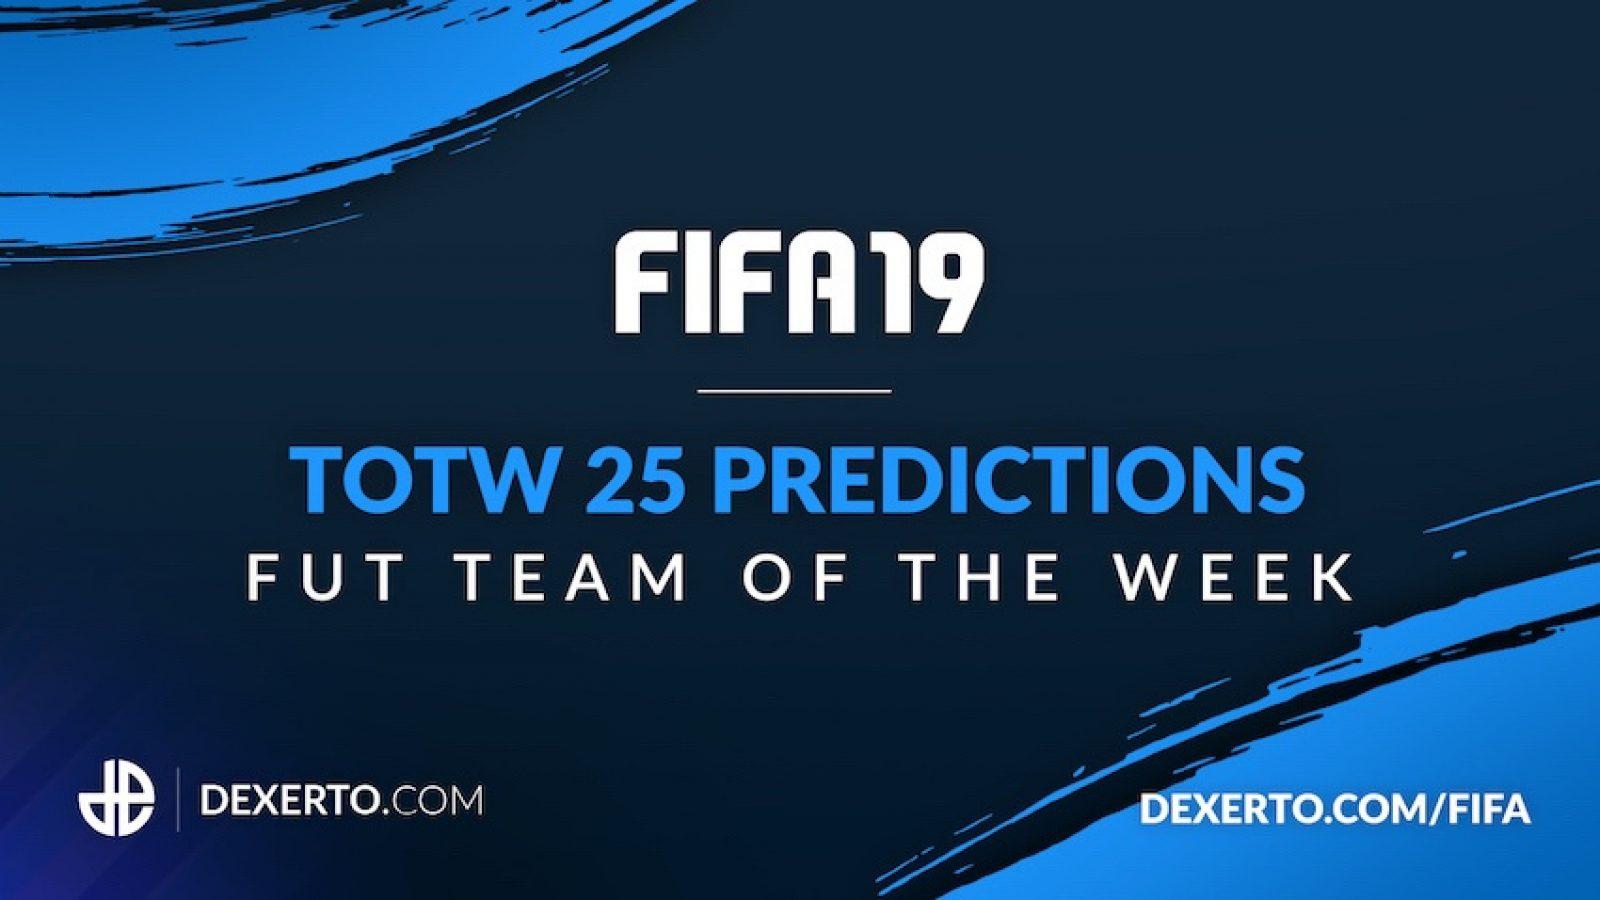 Fifa 19 Totw 25 Predictions Fut Team Of The Week Dexerto